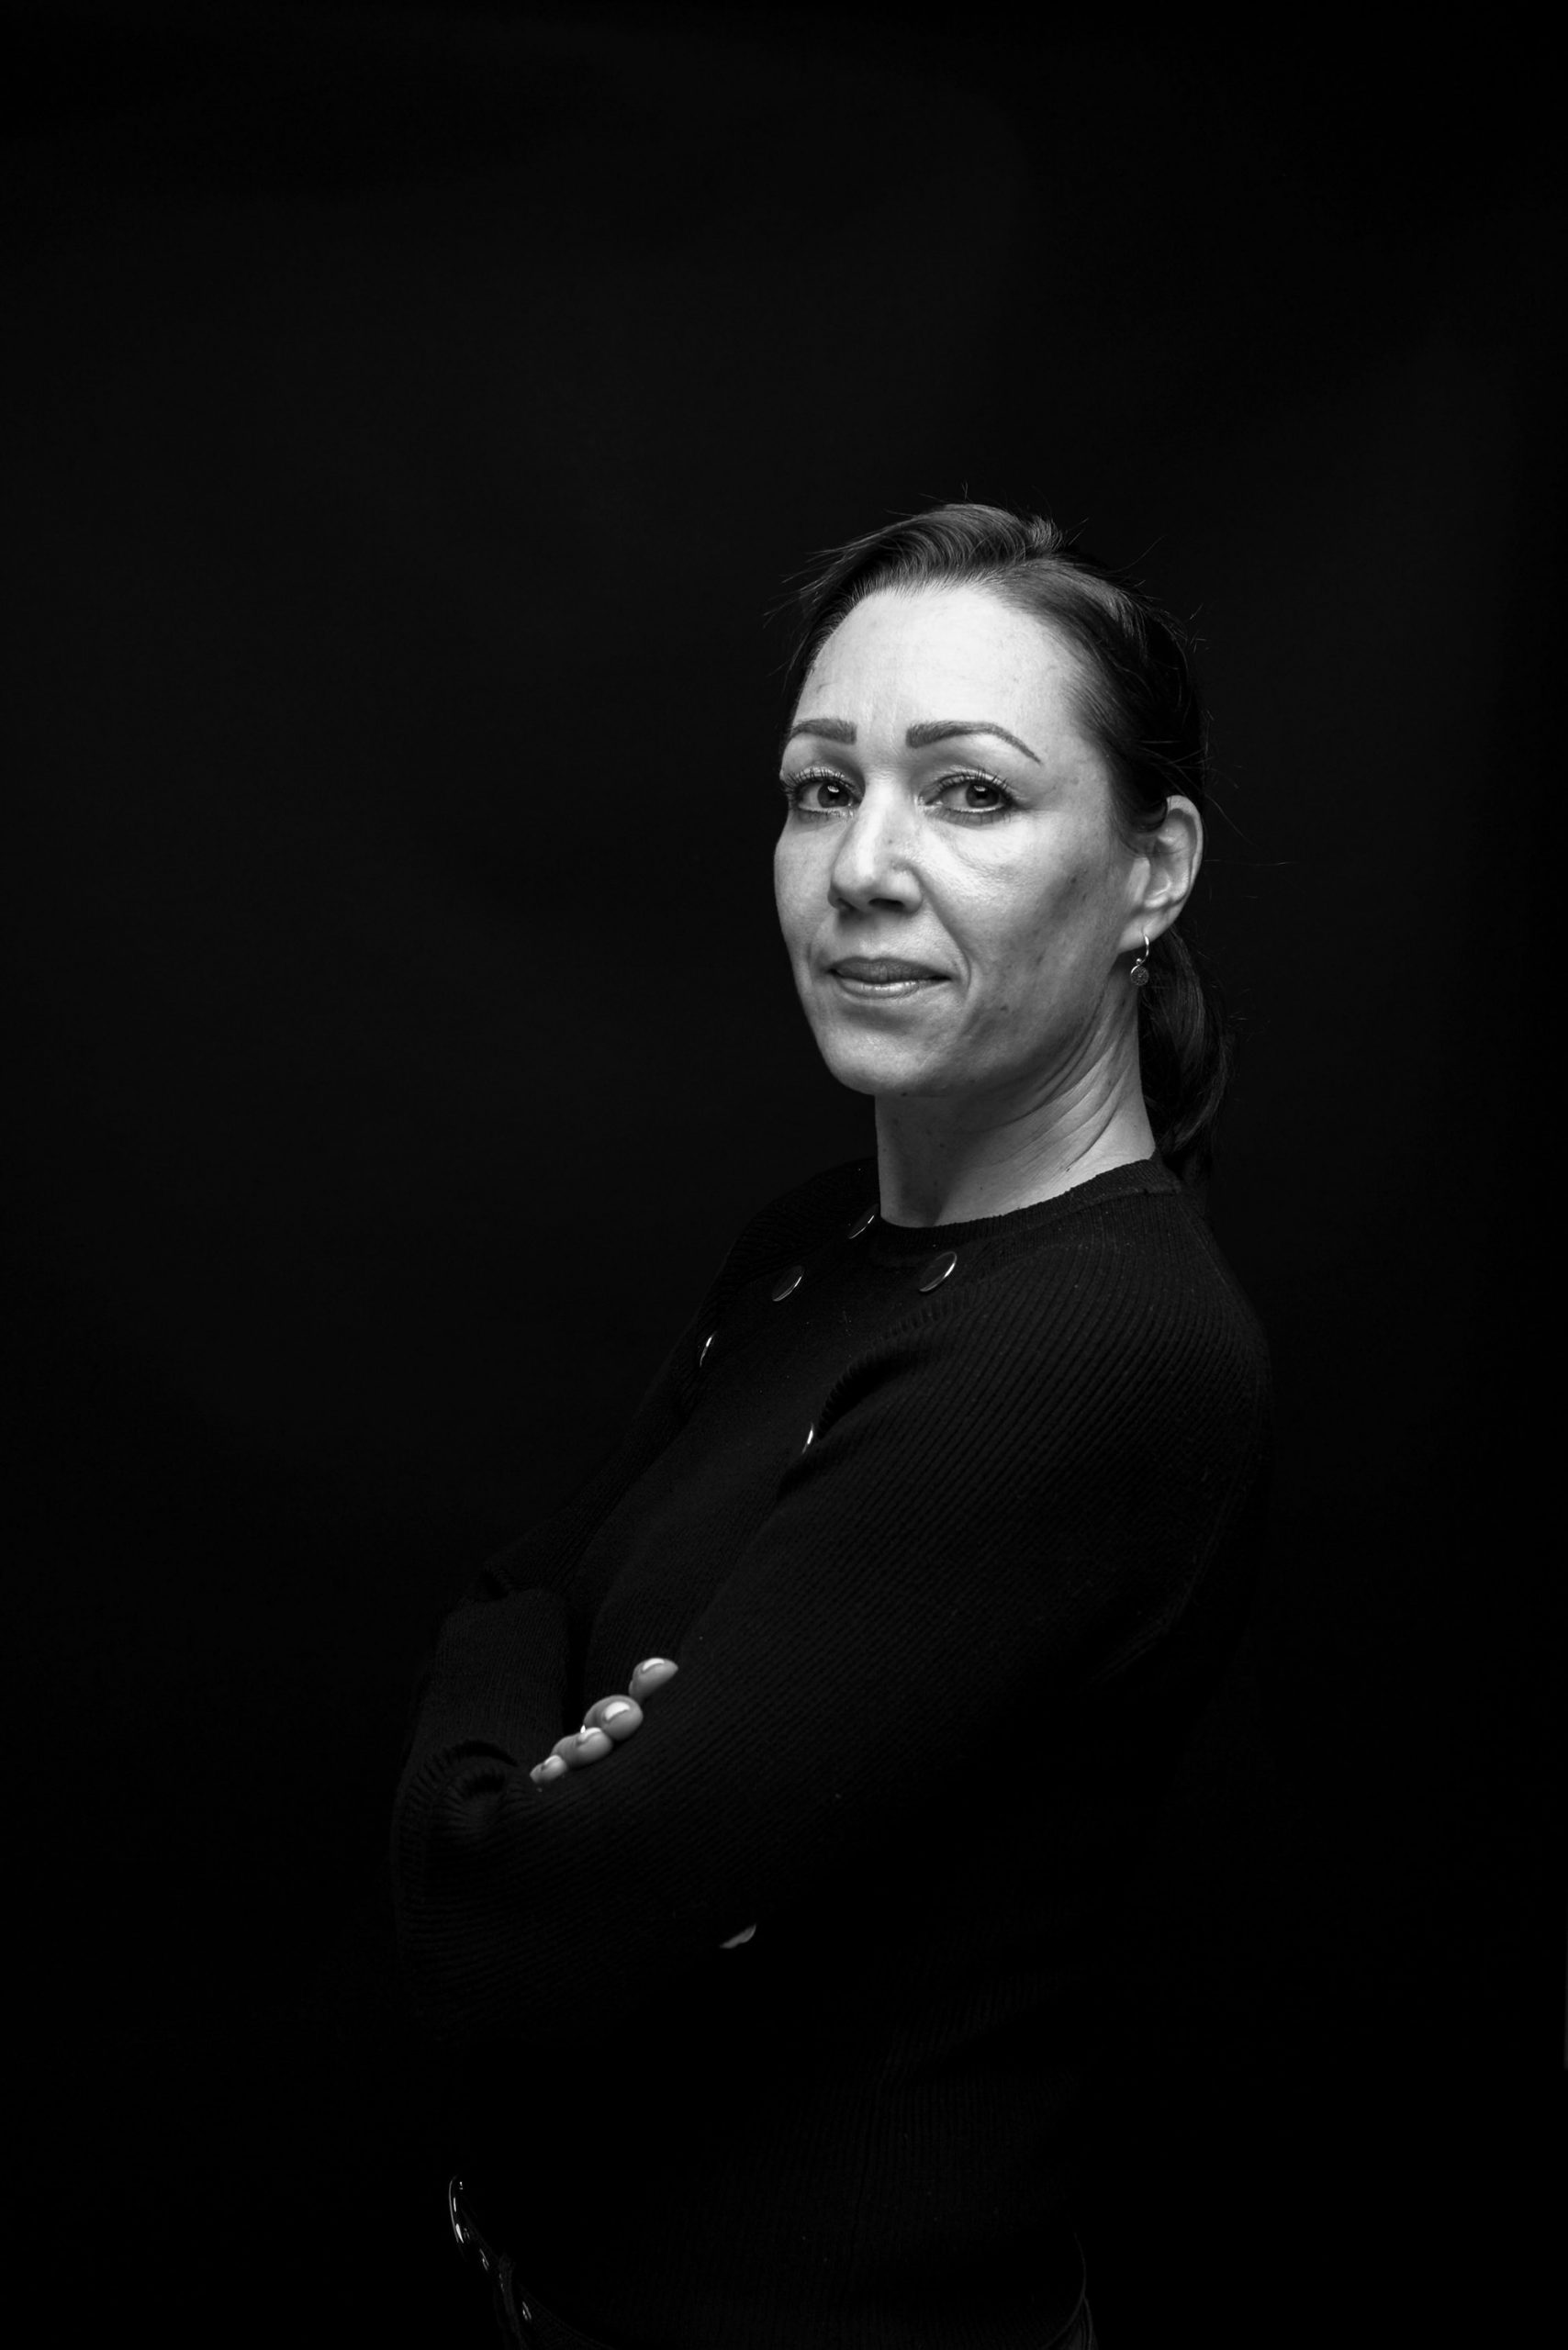 Melanie Reihs